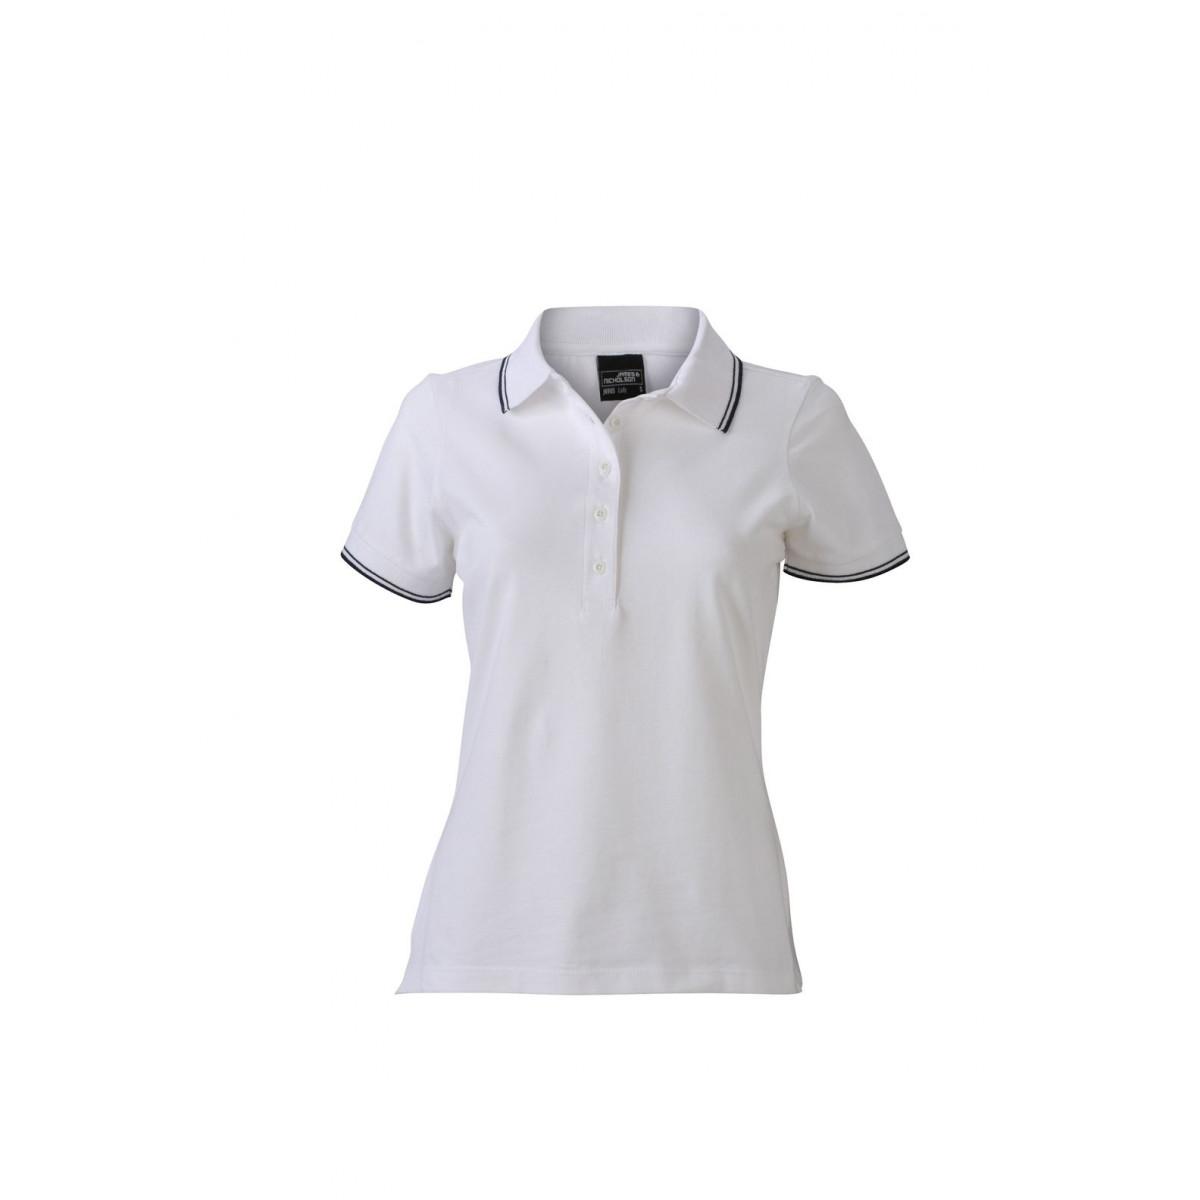 Рубашка поло женская JN985 Ladies Polo - Белый/Темно-синий